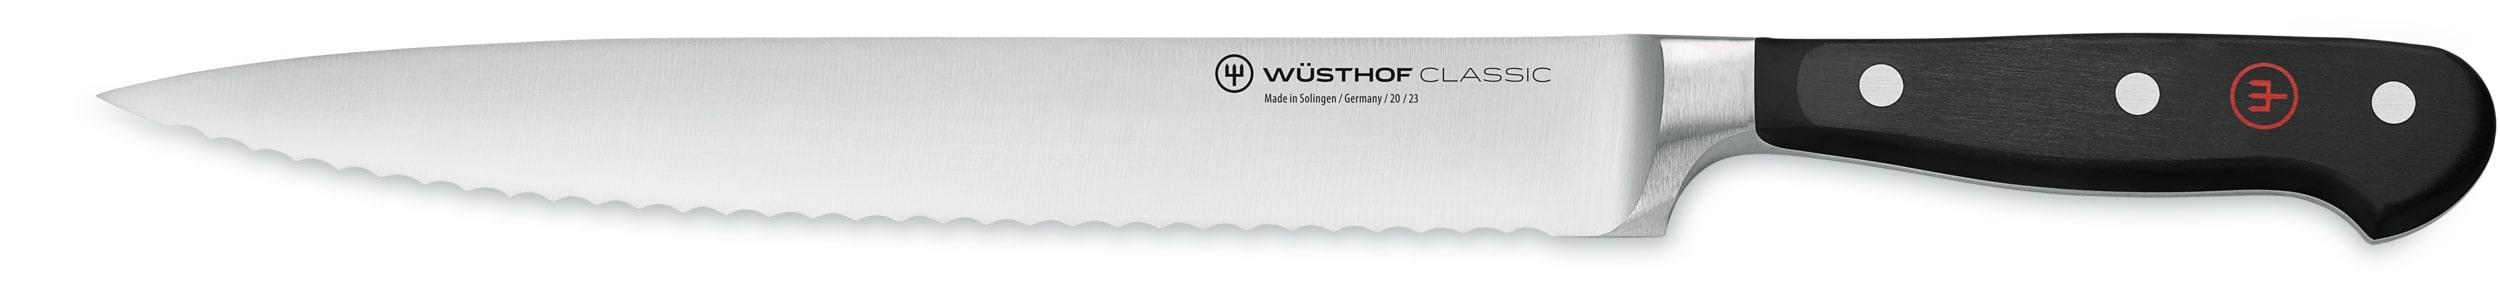 Wusthof Classic Serrated Slicer 23cm